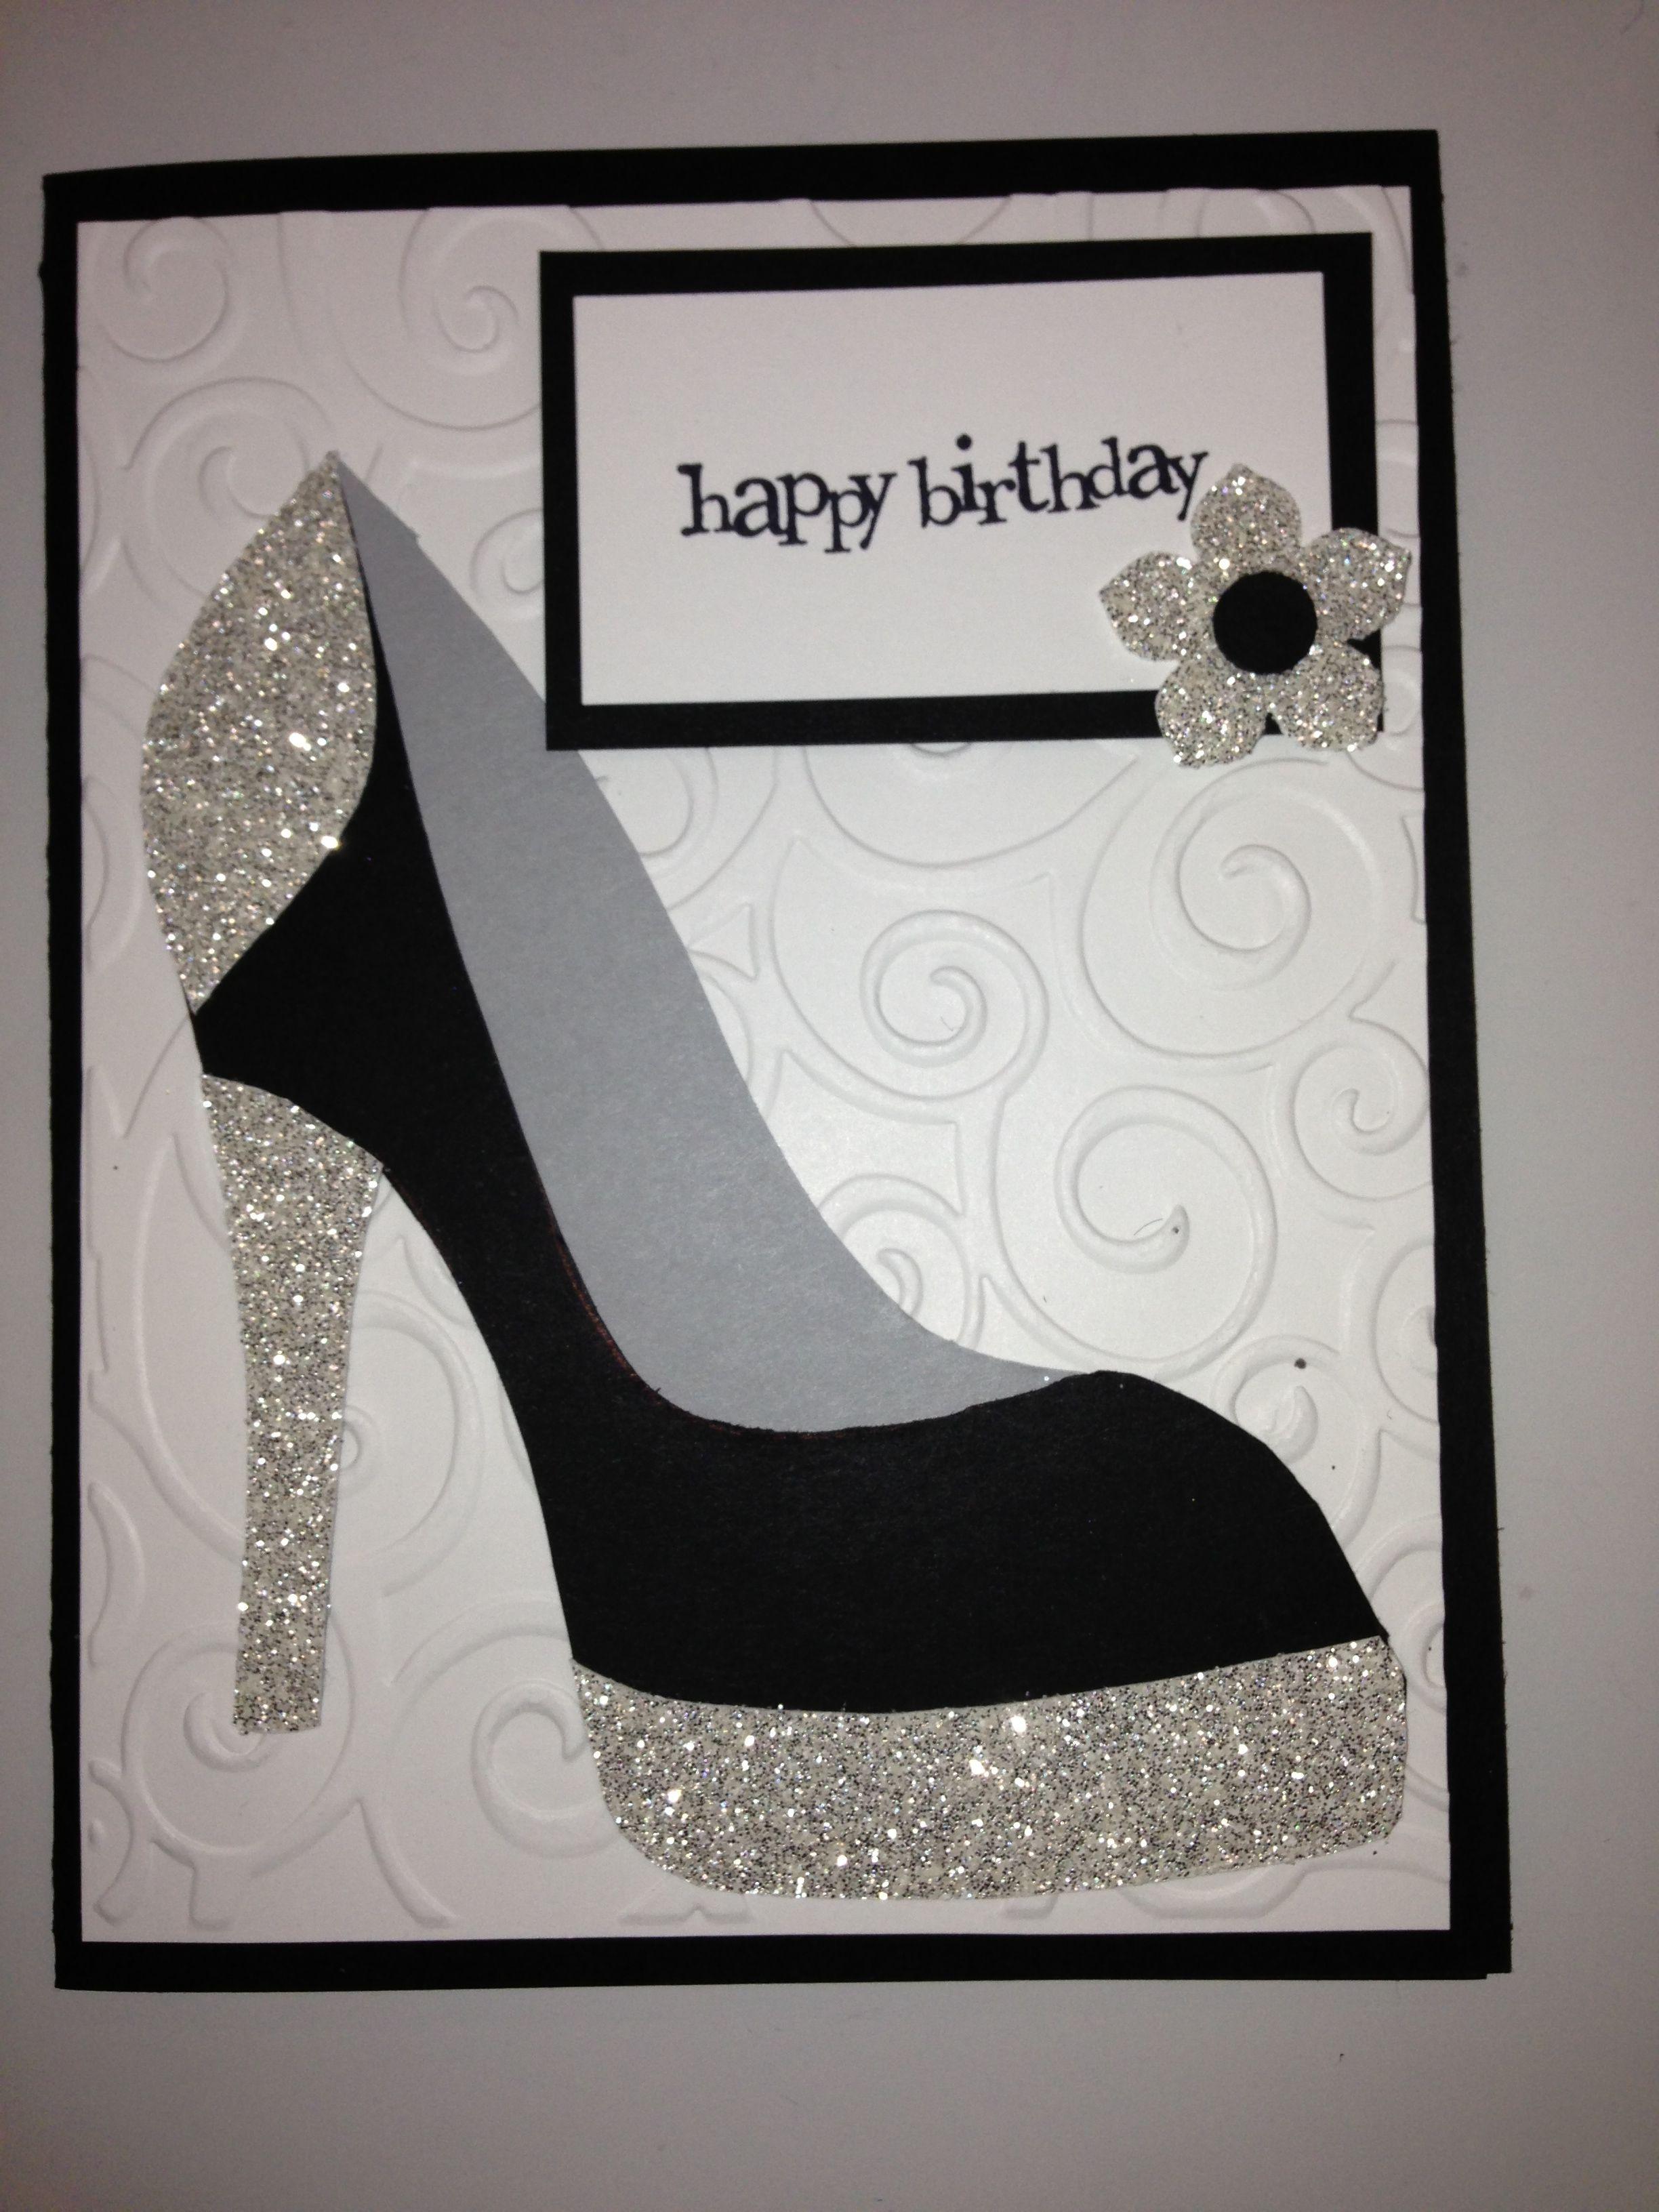 High Heel Shoe Card Birthday Tanya Bell S High Heel Shoe Pertaining To High Heel Template For Cards Birthday Cards Diy Shoe Template Birthday Cards For Women